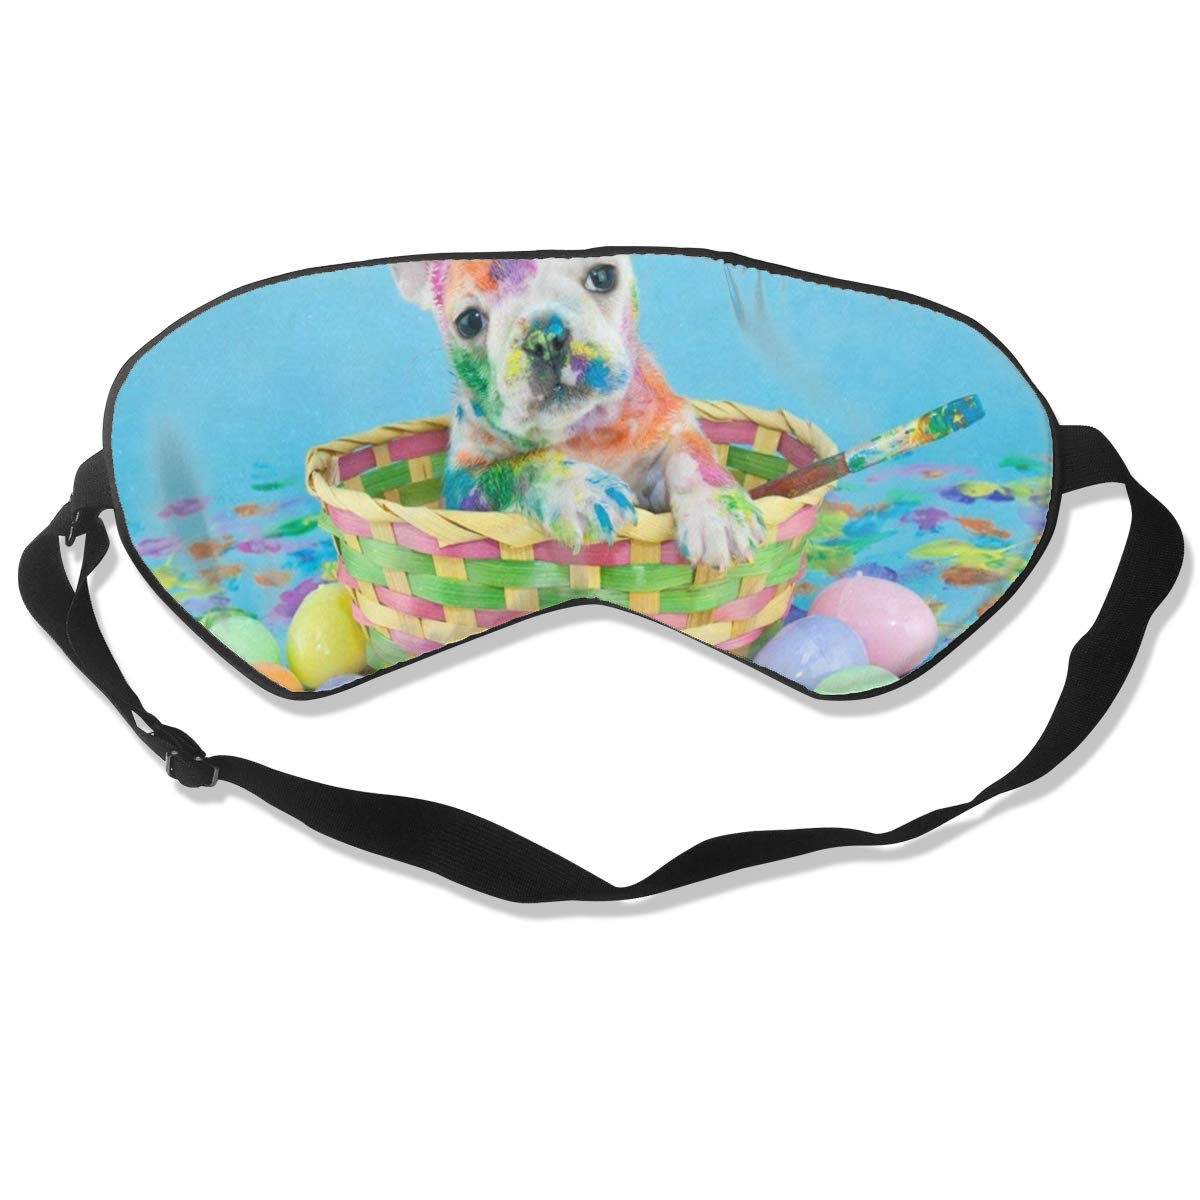 All agree Sleep Mask Frog Animal Pond Green Eye Mask Cover with Adjustable Strap Eyemask for Travel, Nap, Meditation, Blindfold